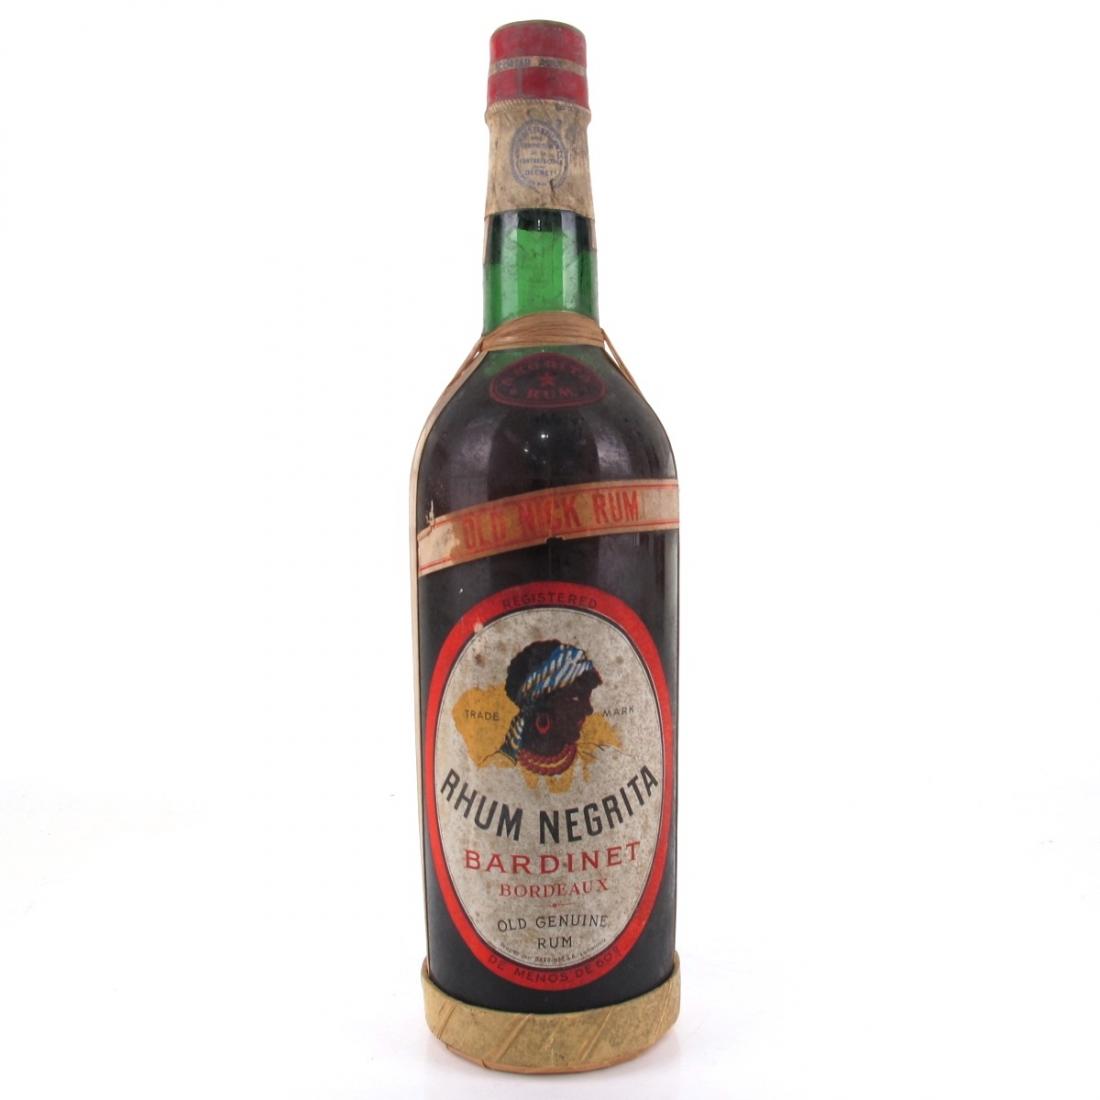 Negrita Rhum Berdinet Rum 1950s